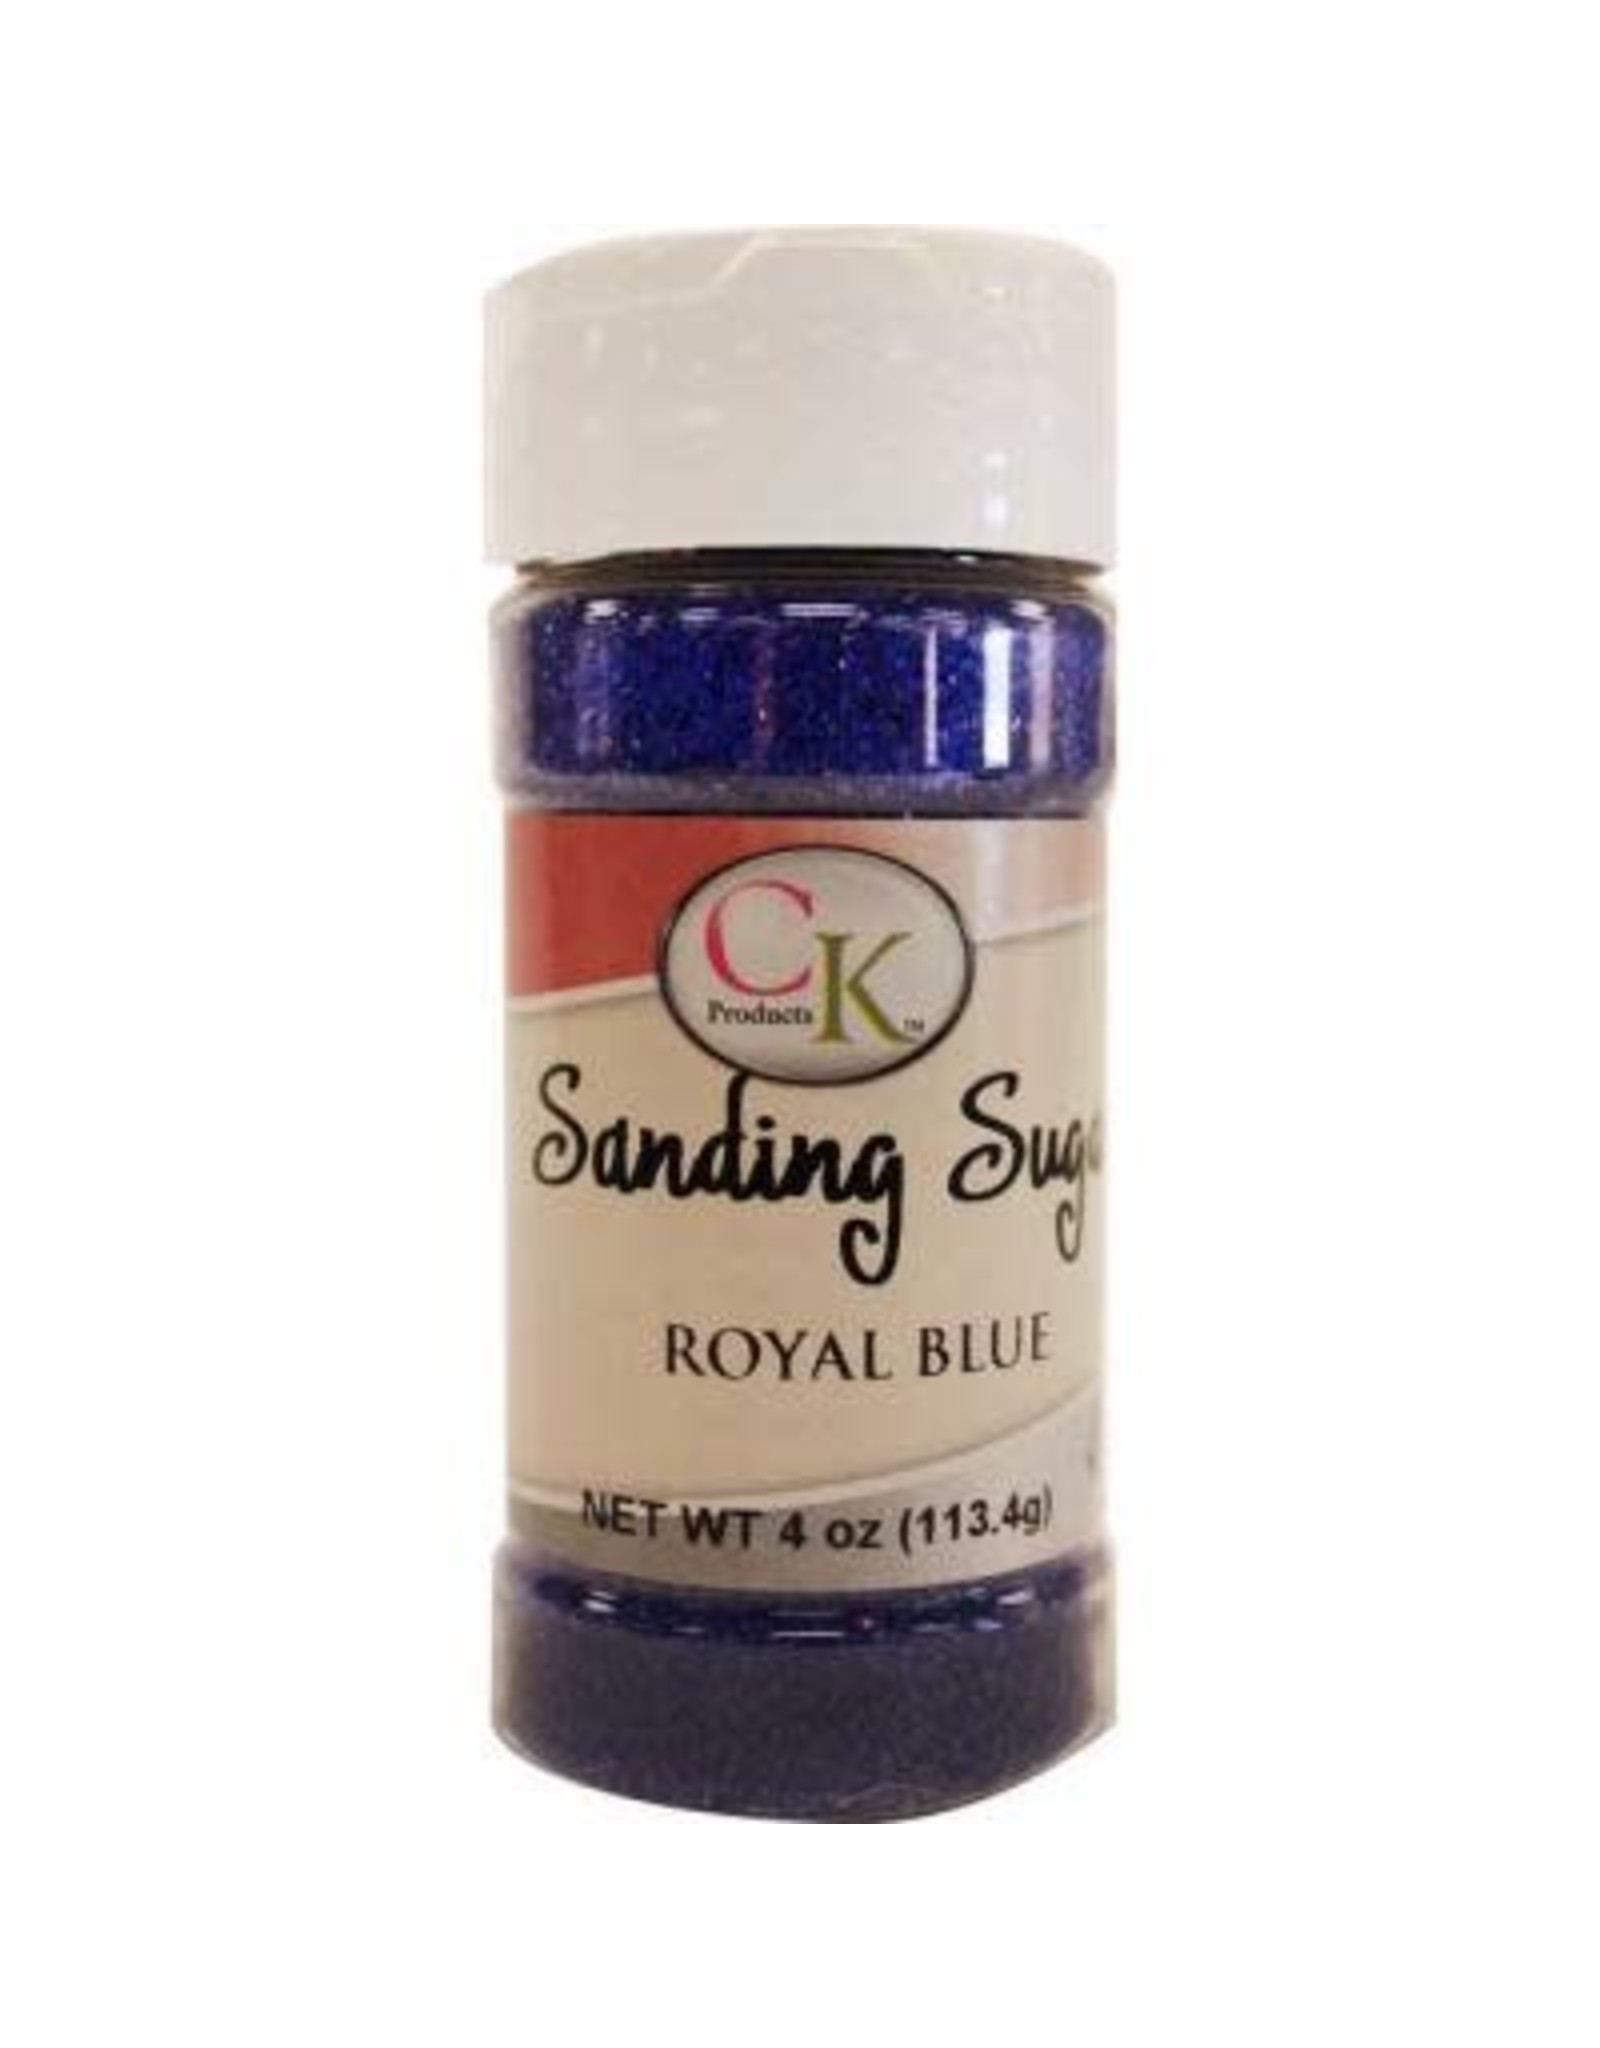 CK Royal Blue Sanding Sugar